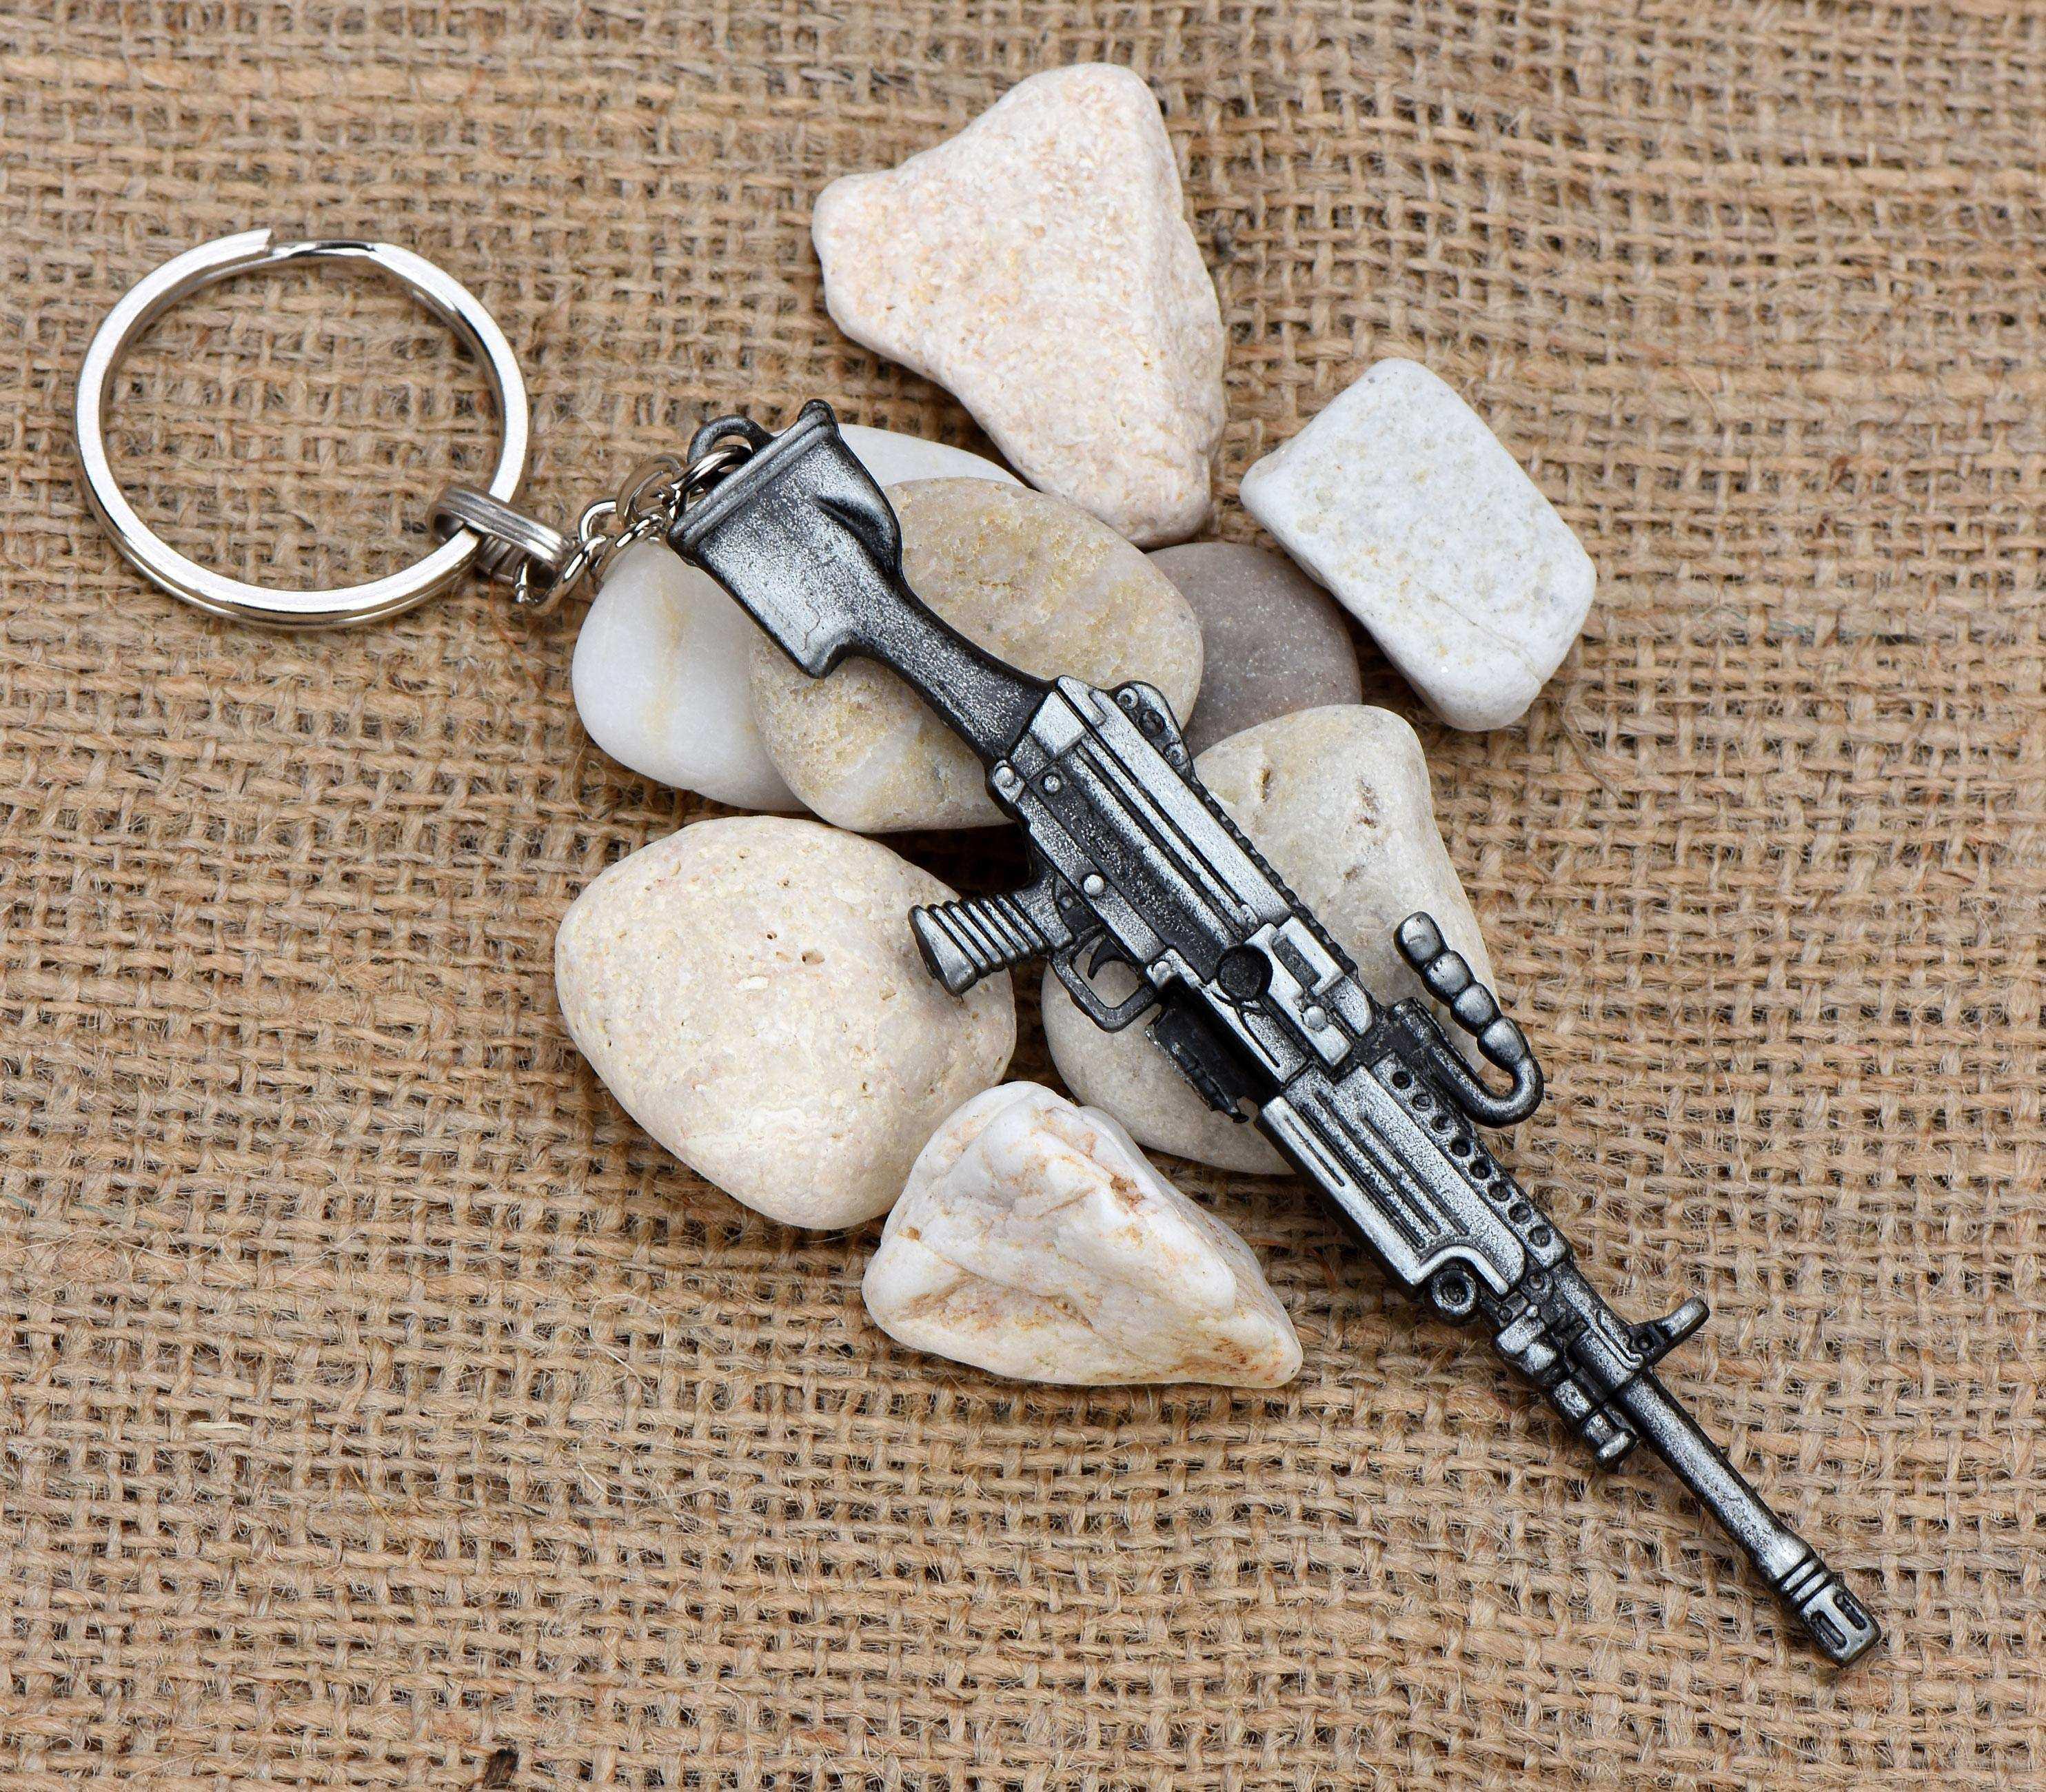 PUBG M249 Anahtarlık - ANA0039